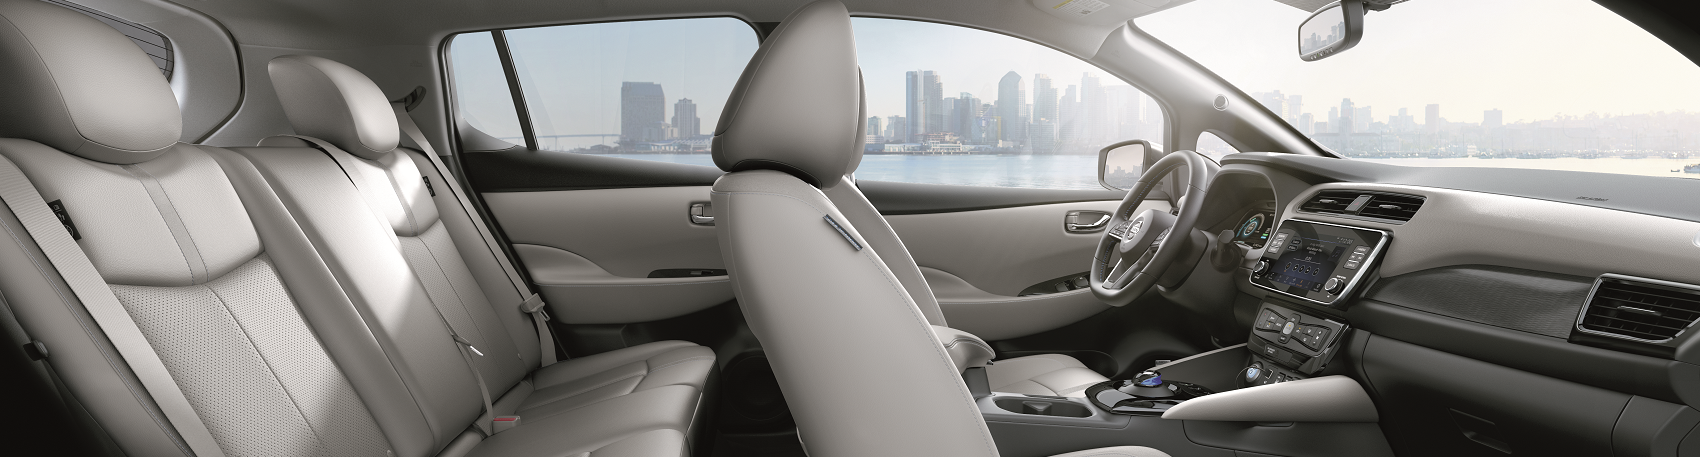 2019 Nissan LEAF Interior Space